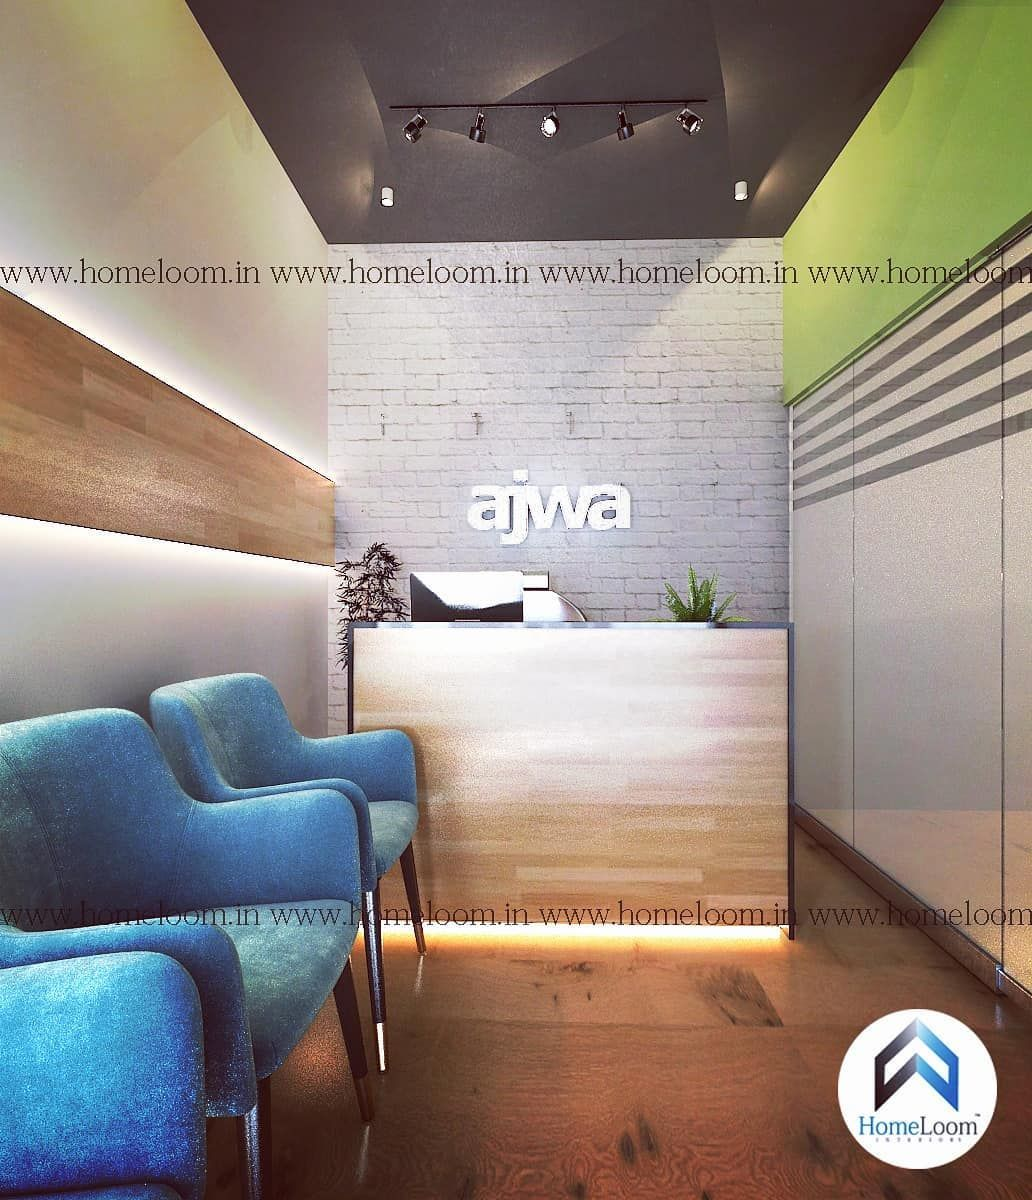 Home Officeinterior Design Ideas: Office Interiors? We Got Your Back!! #interirordesign